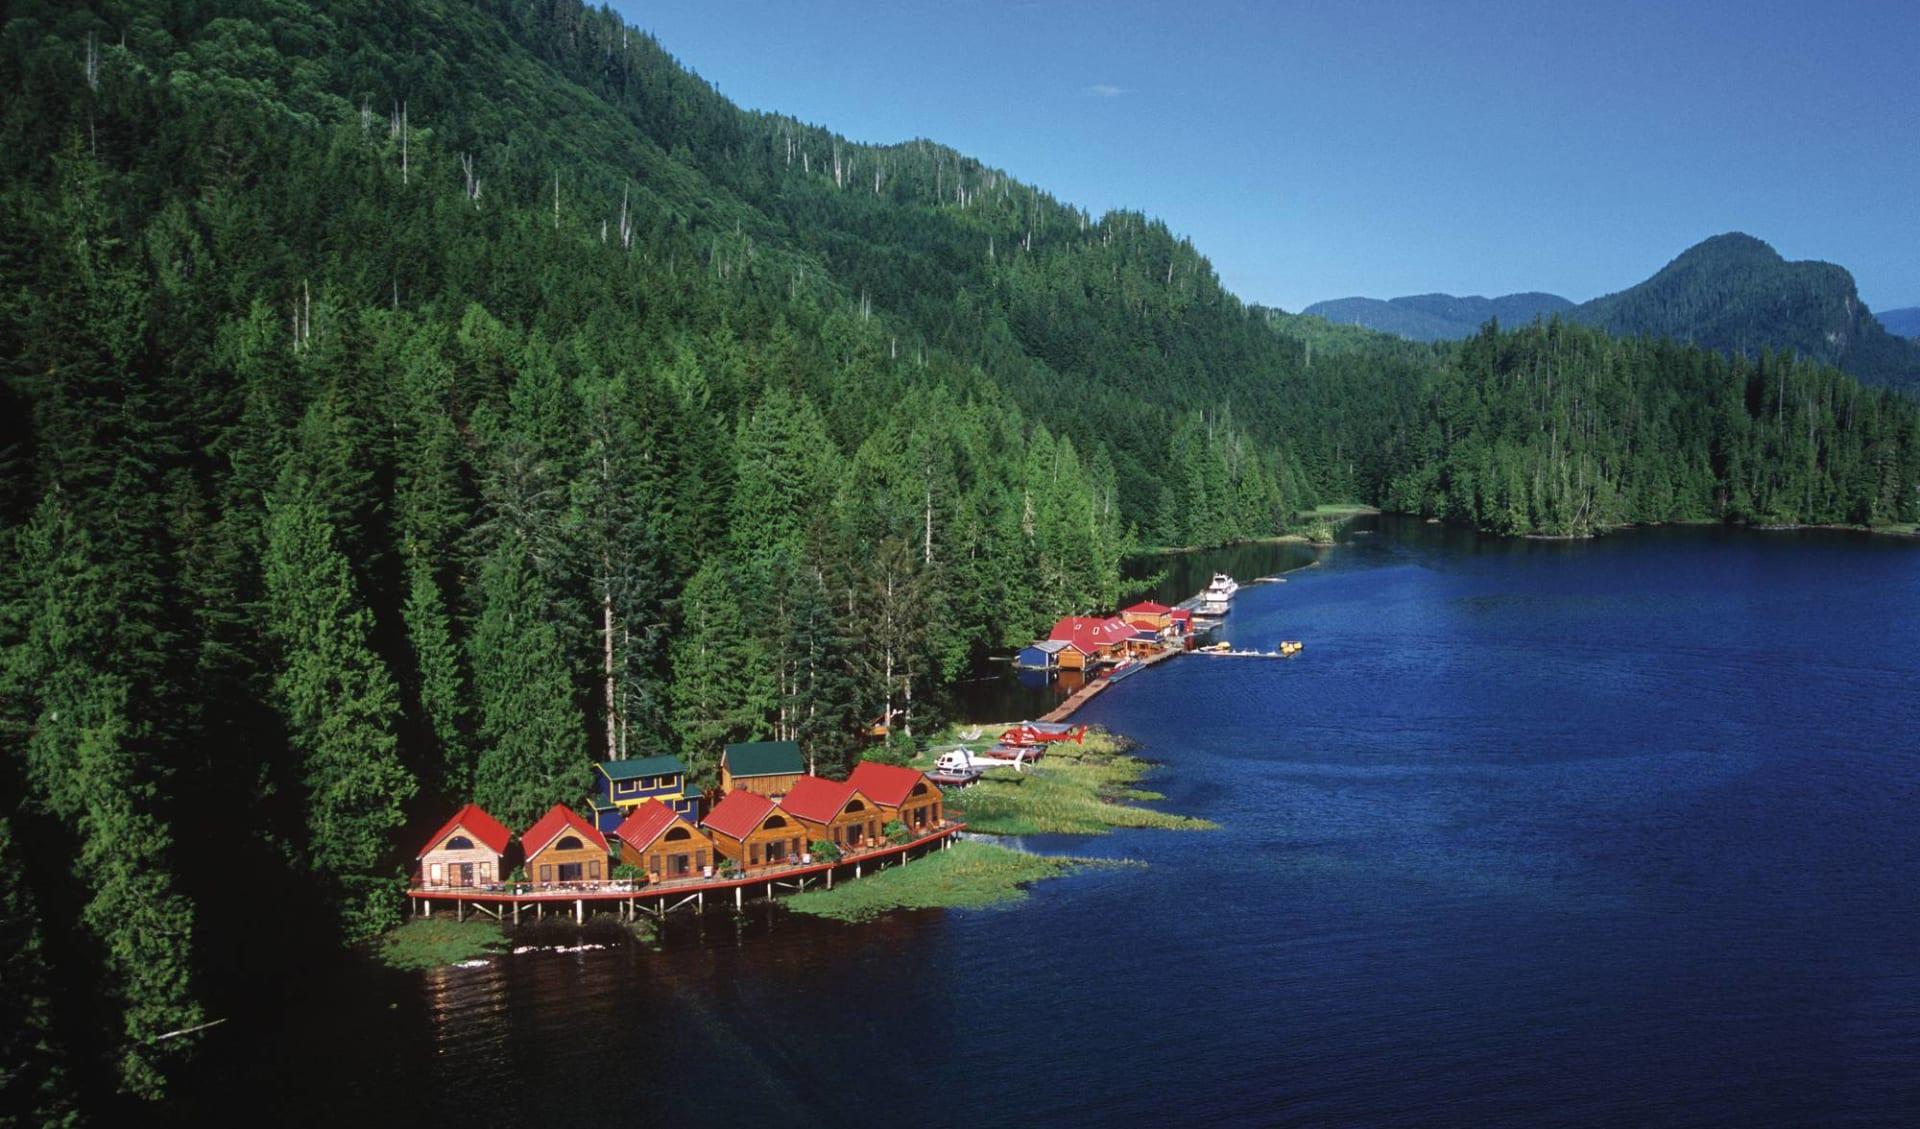 Nimmo Bay Resort in Port McNeill: _Nimmo Bay Wilderness Resort - Waterfront Cabins